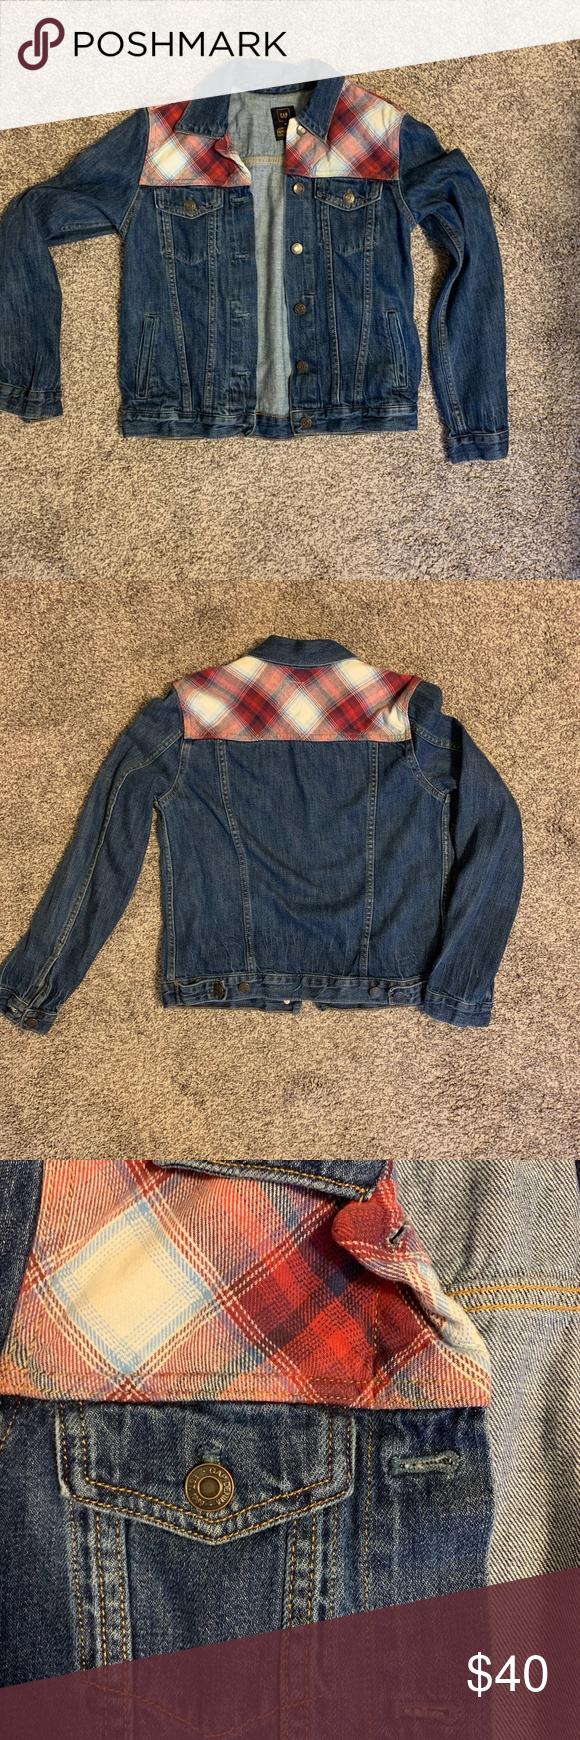 Gap Pendleton Denim Jacket With Flannel Denim Jacket Pendleton Jackets [ 1740 x 580 Pixel ]